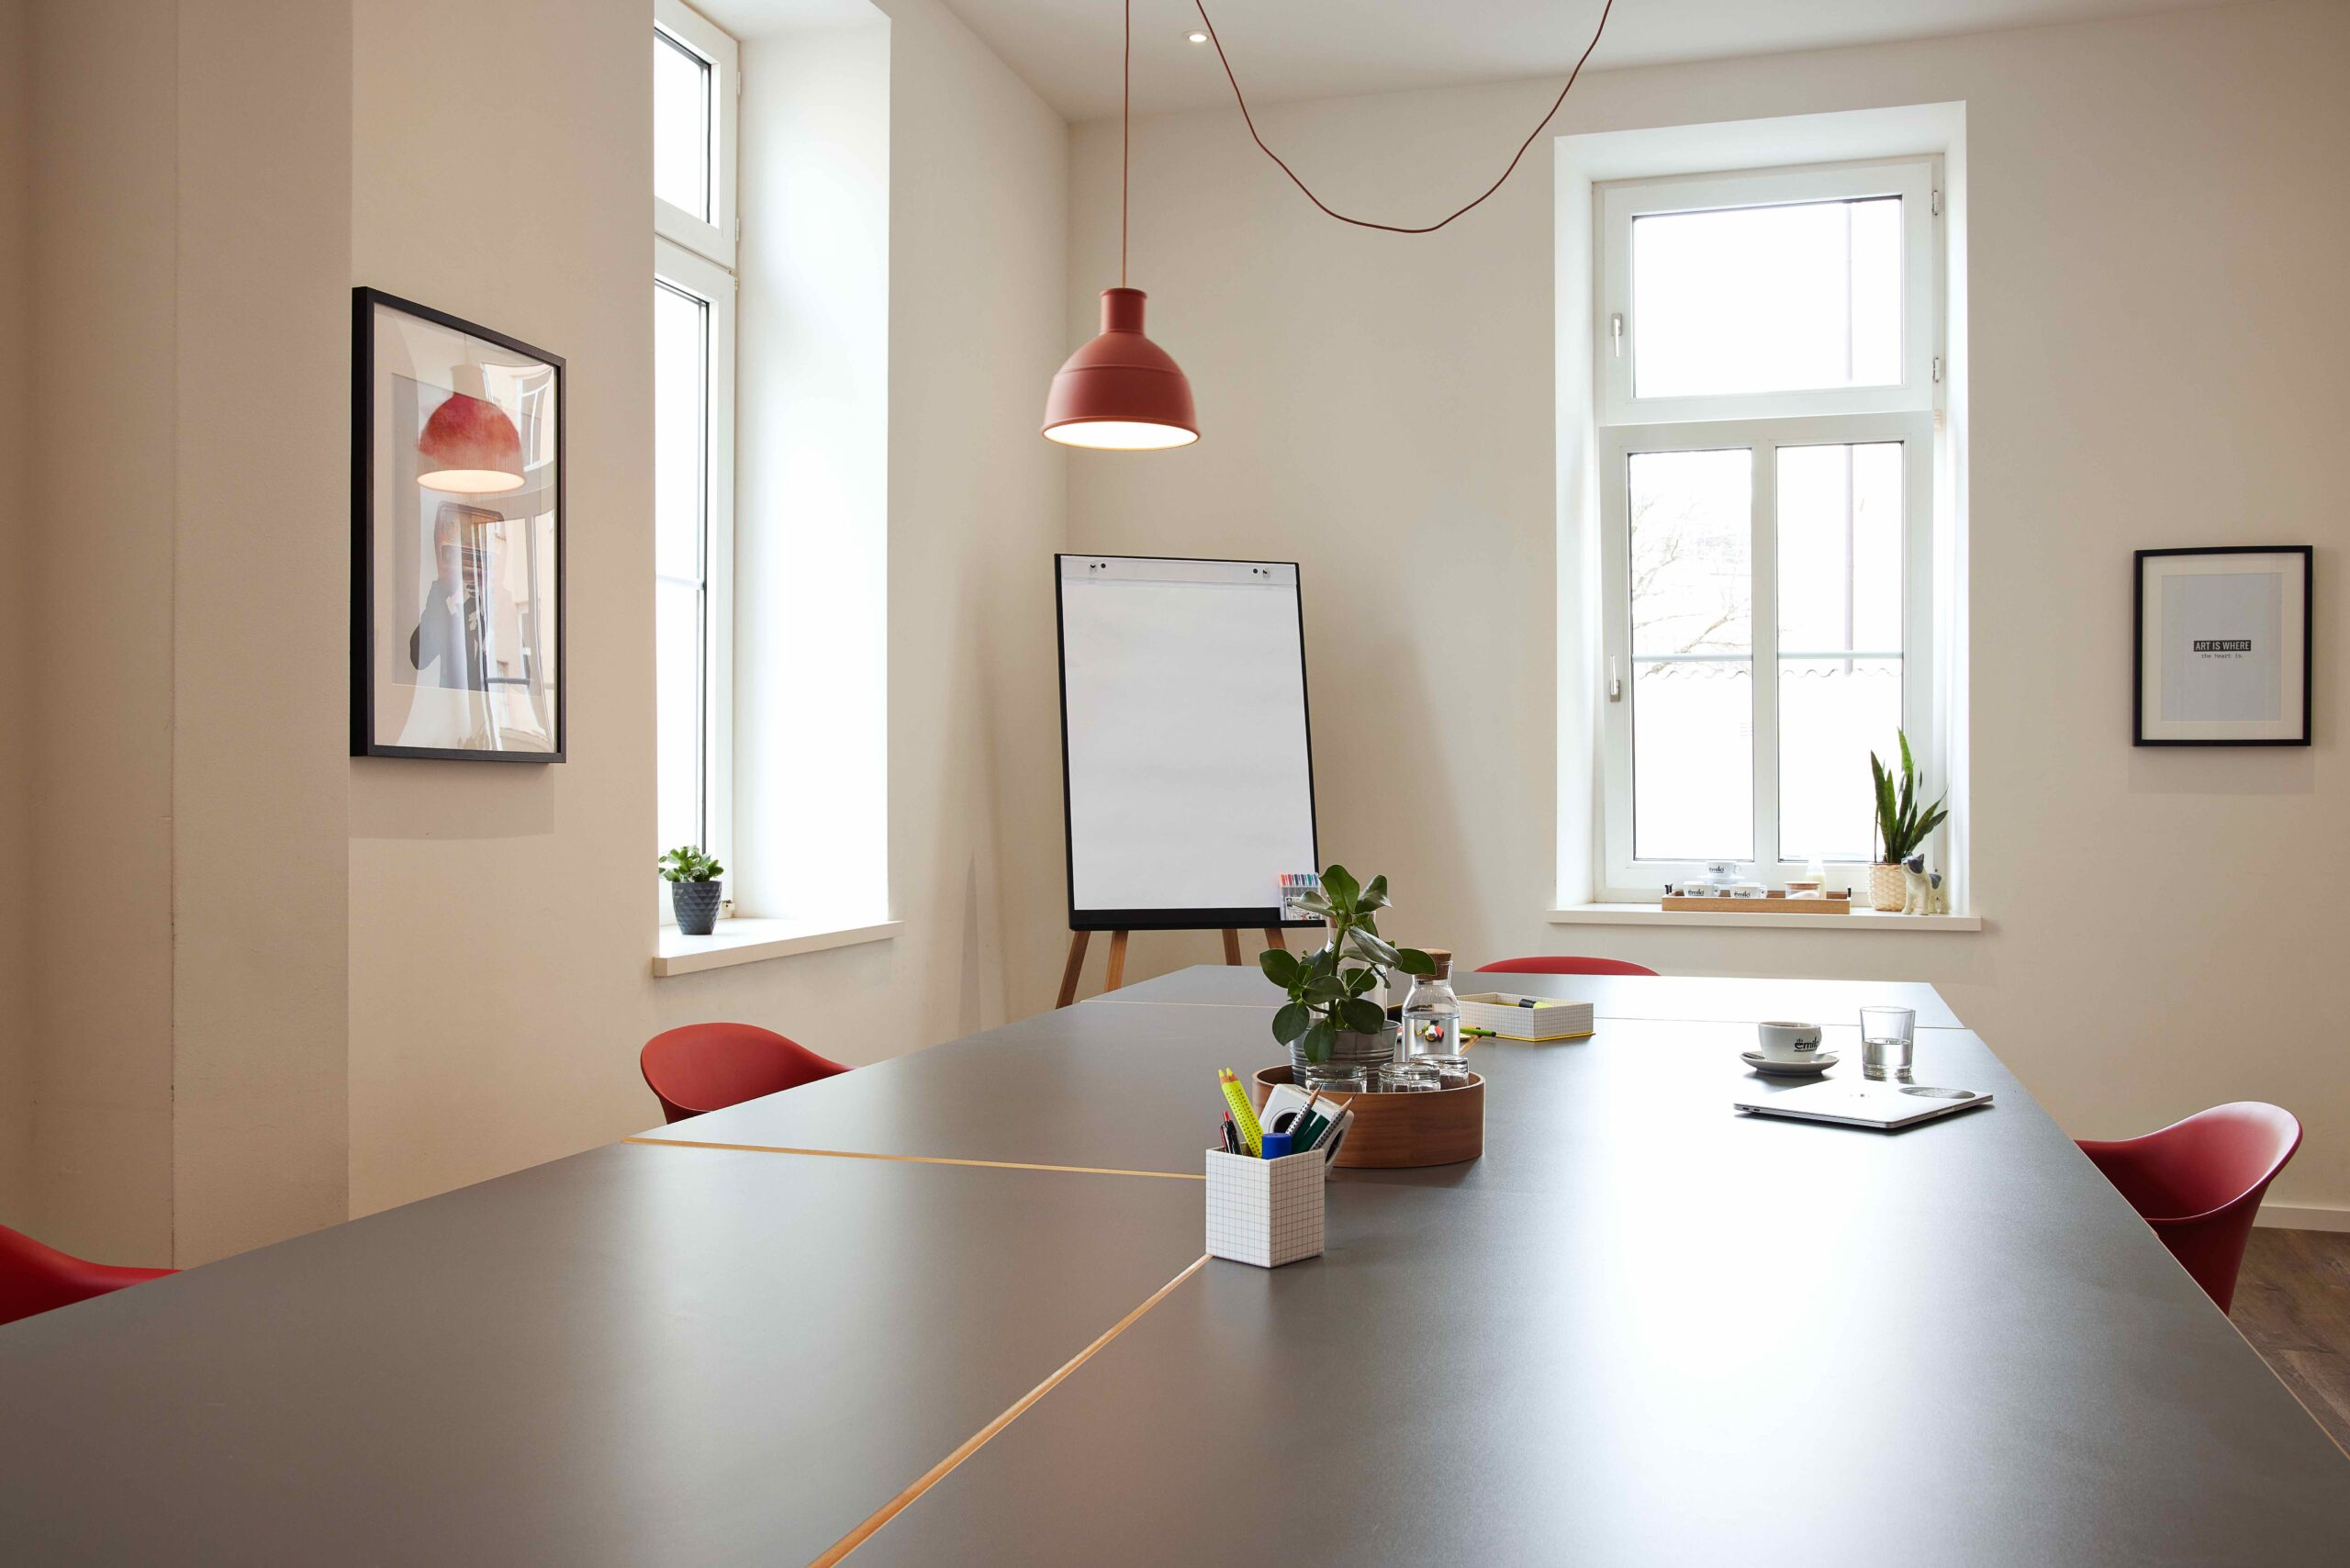 Meetingraum Grey Room